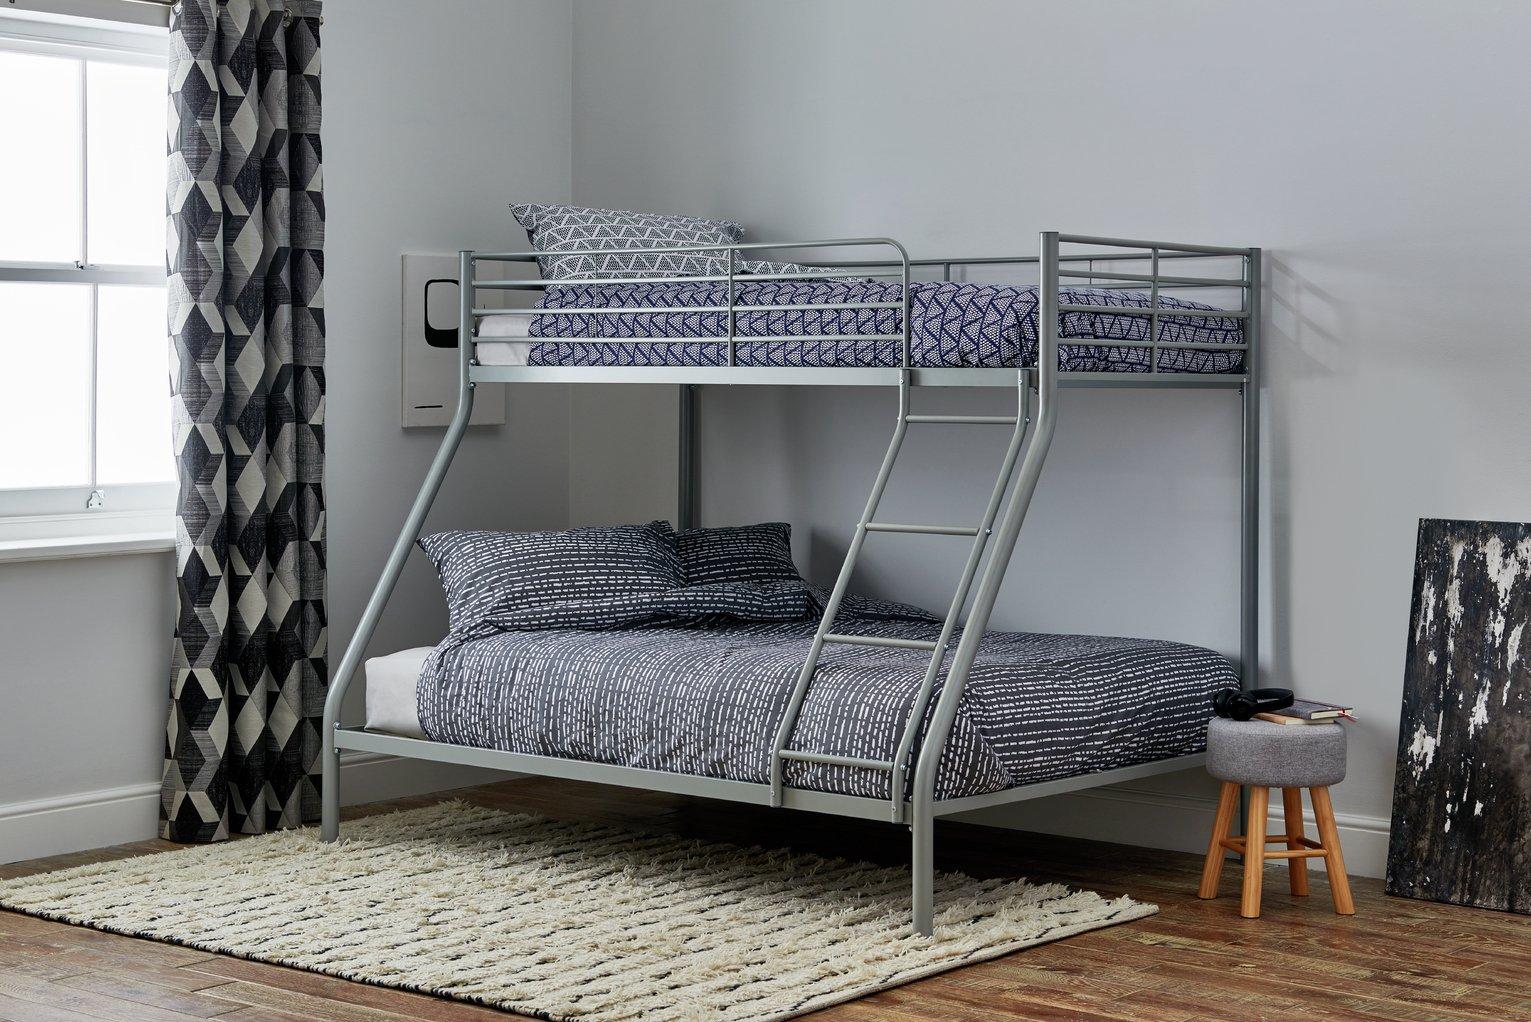 Argos Home Willen Metal Triple Bunk Bed - Silver